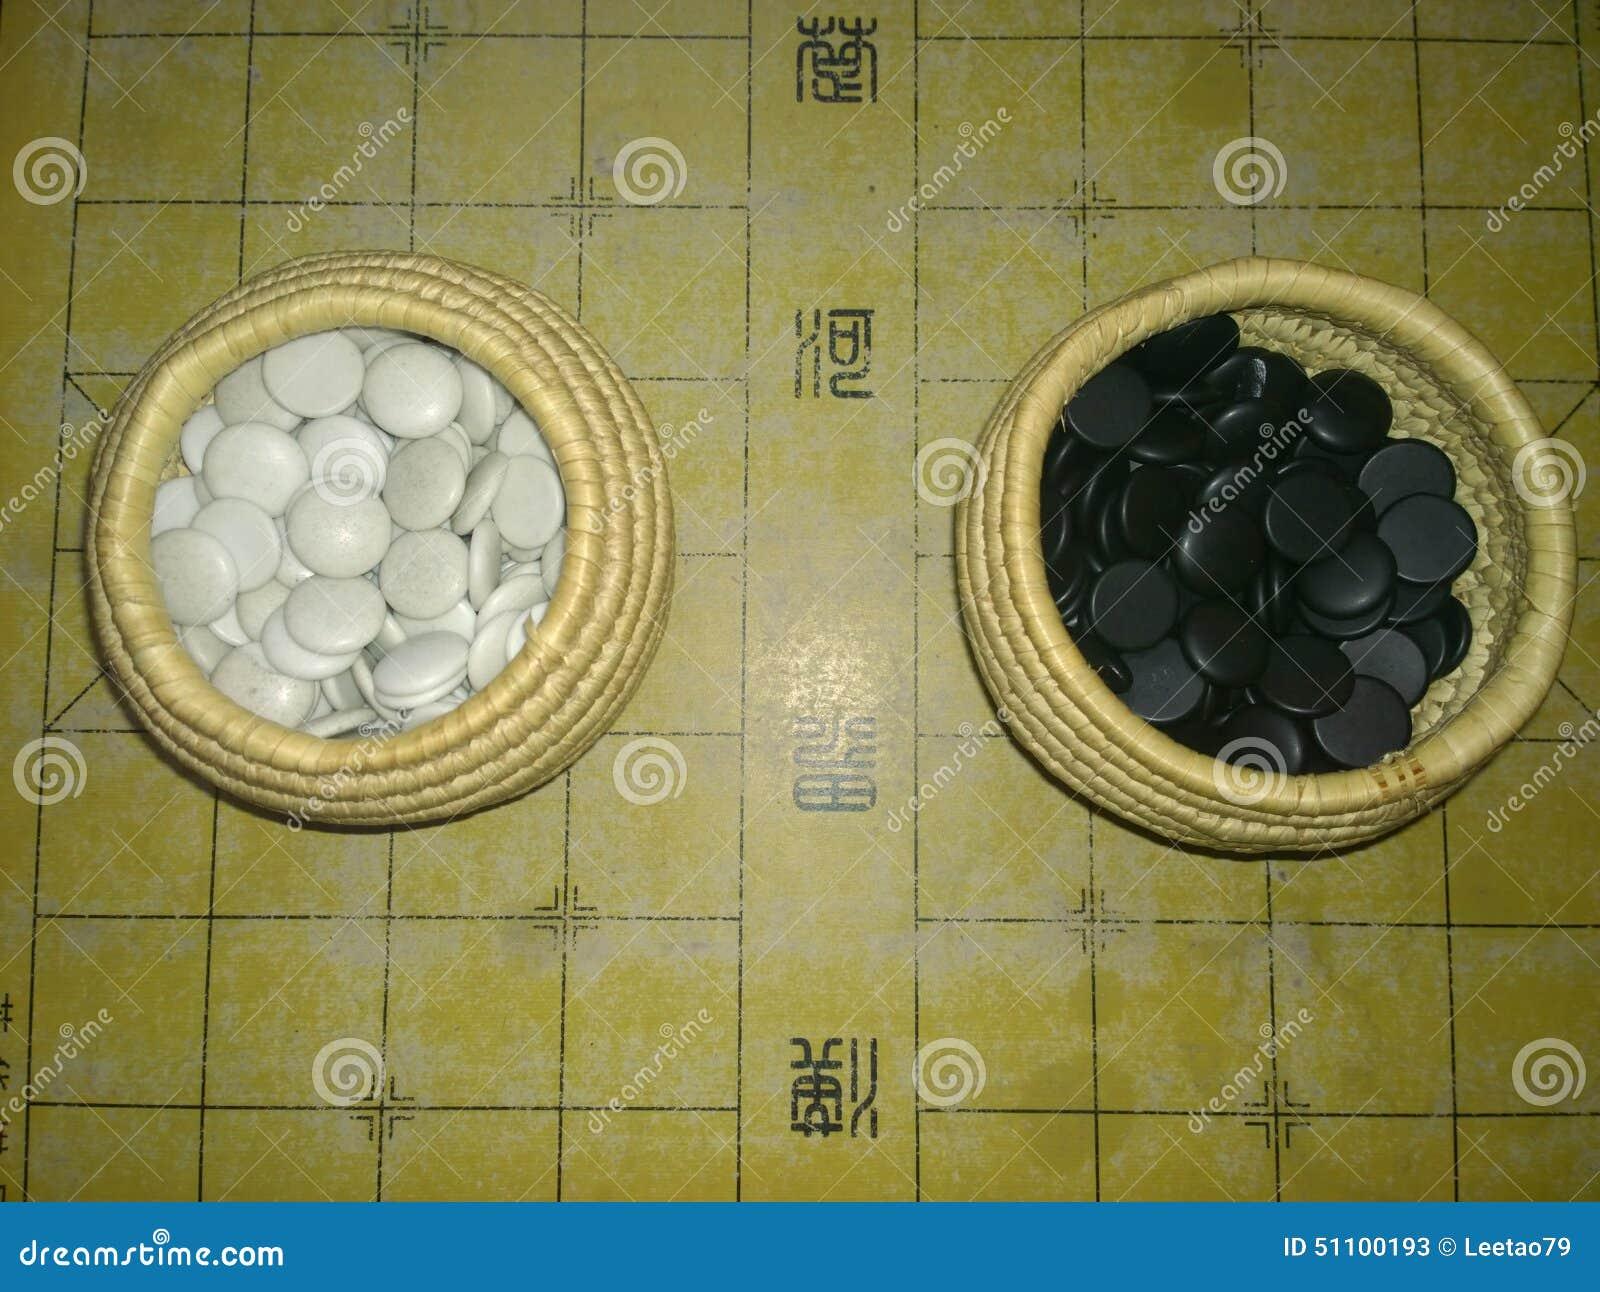 Go stock image  Image of aspect, chessboard, canceled - 51100193